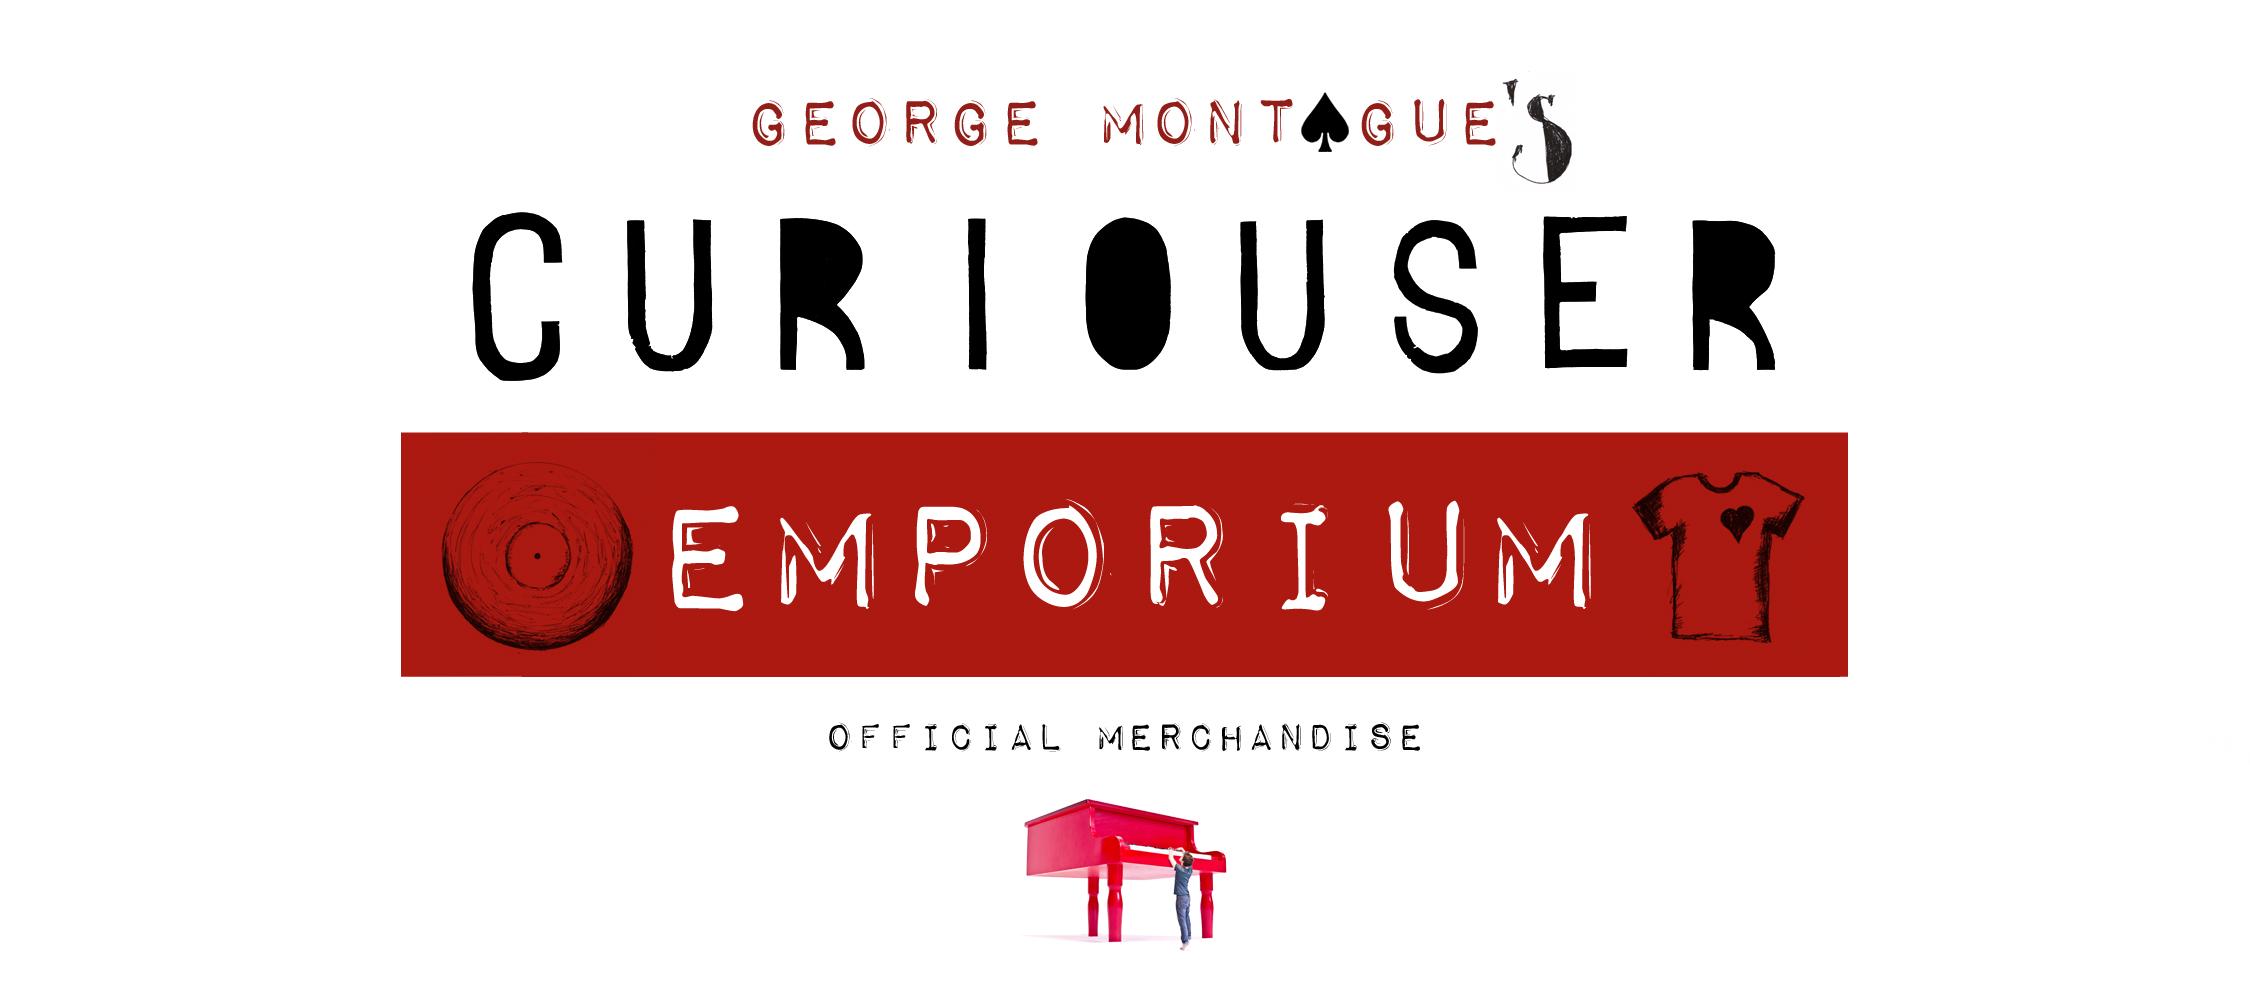 George Montague